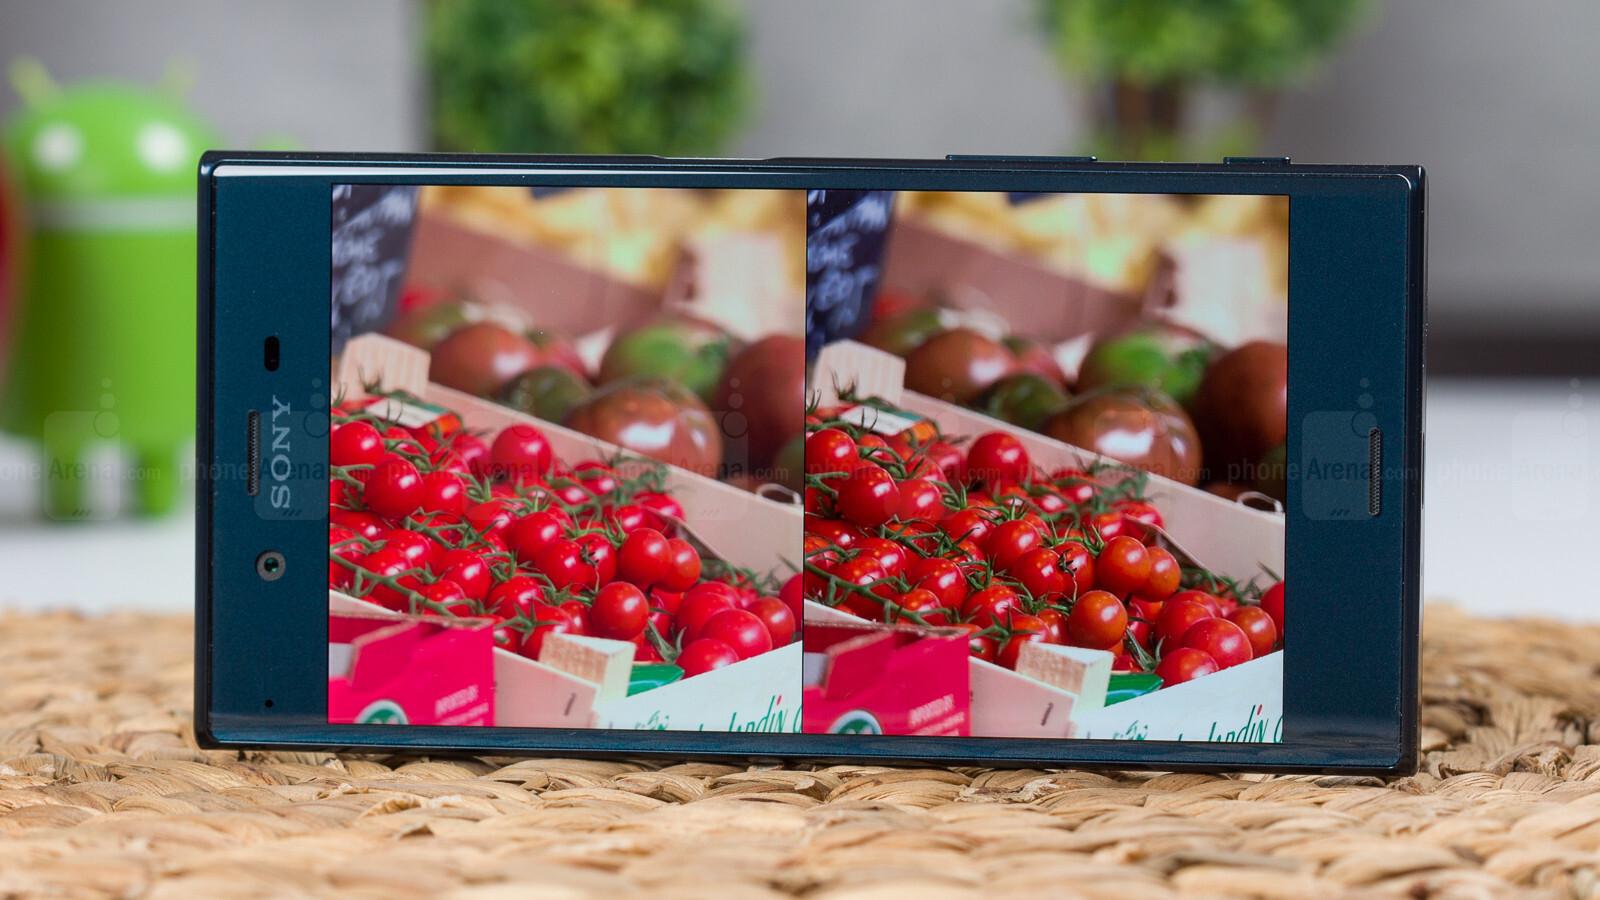 Firmware flash enables fingerprint on US Xperia XZ + X Compact